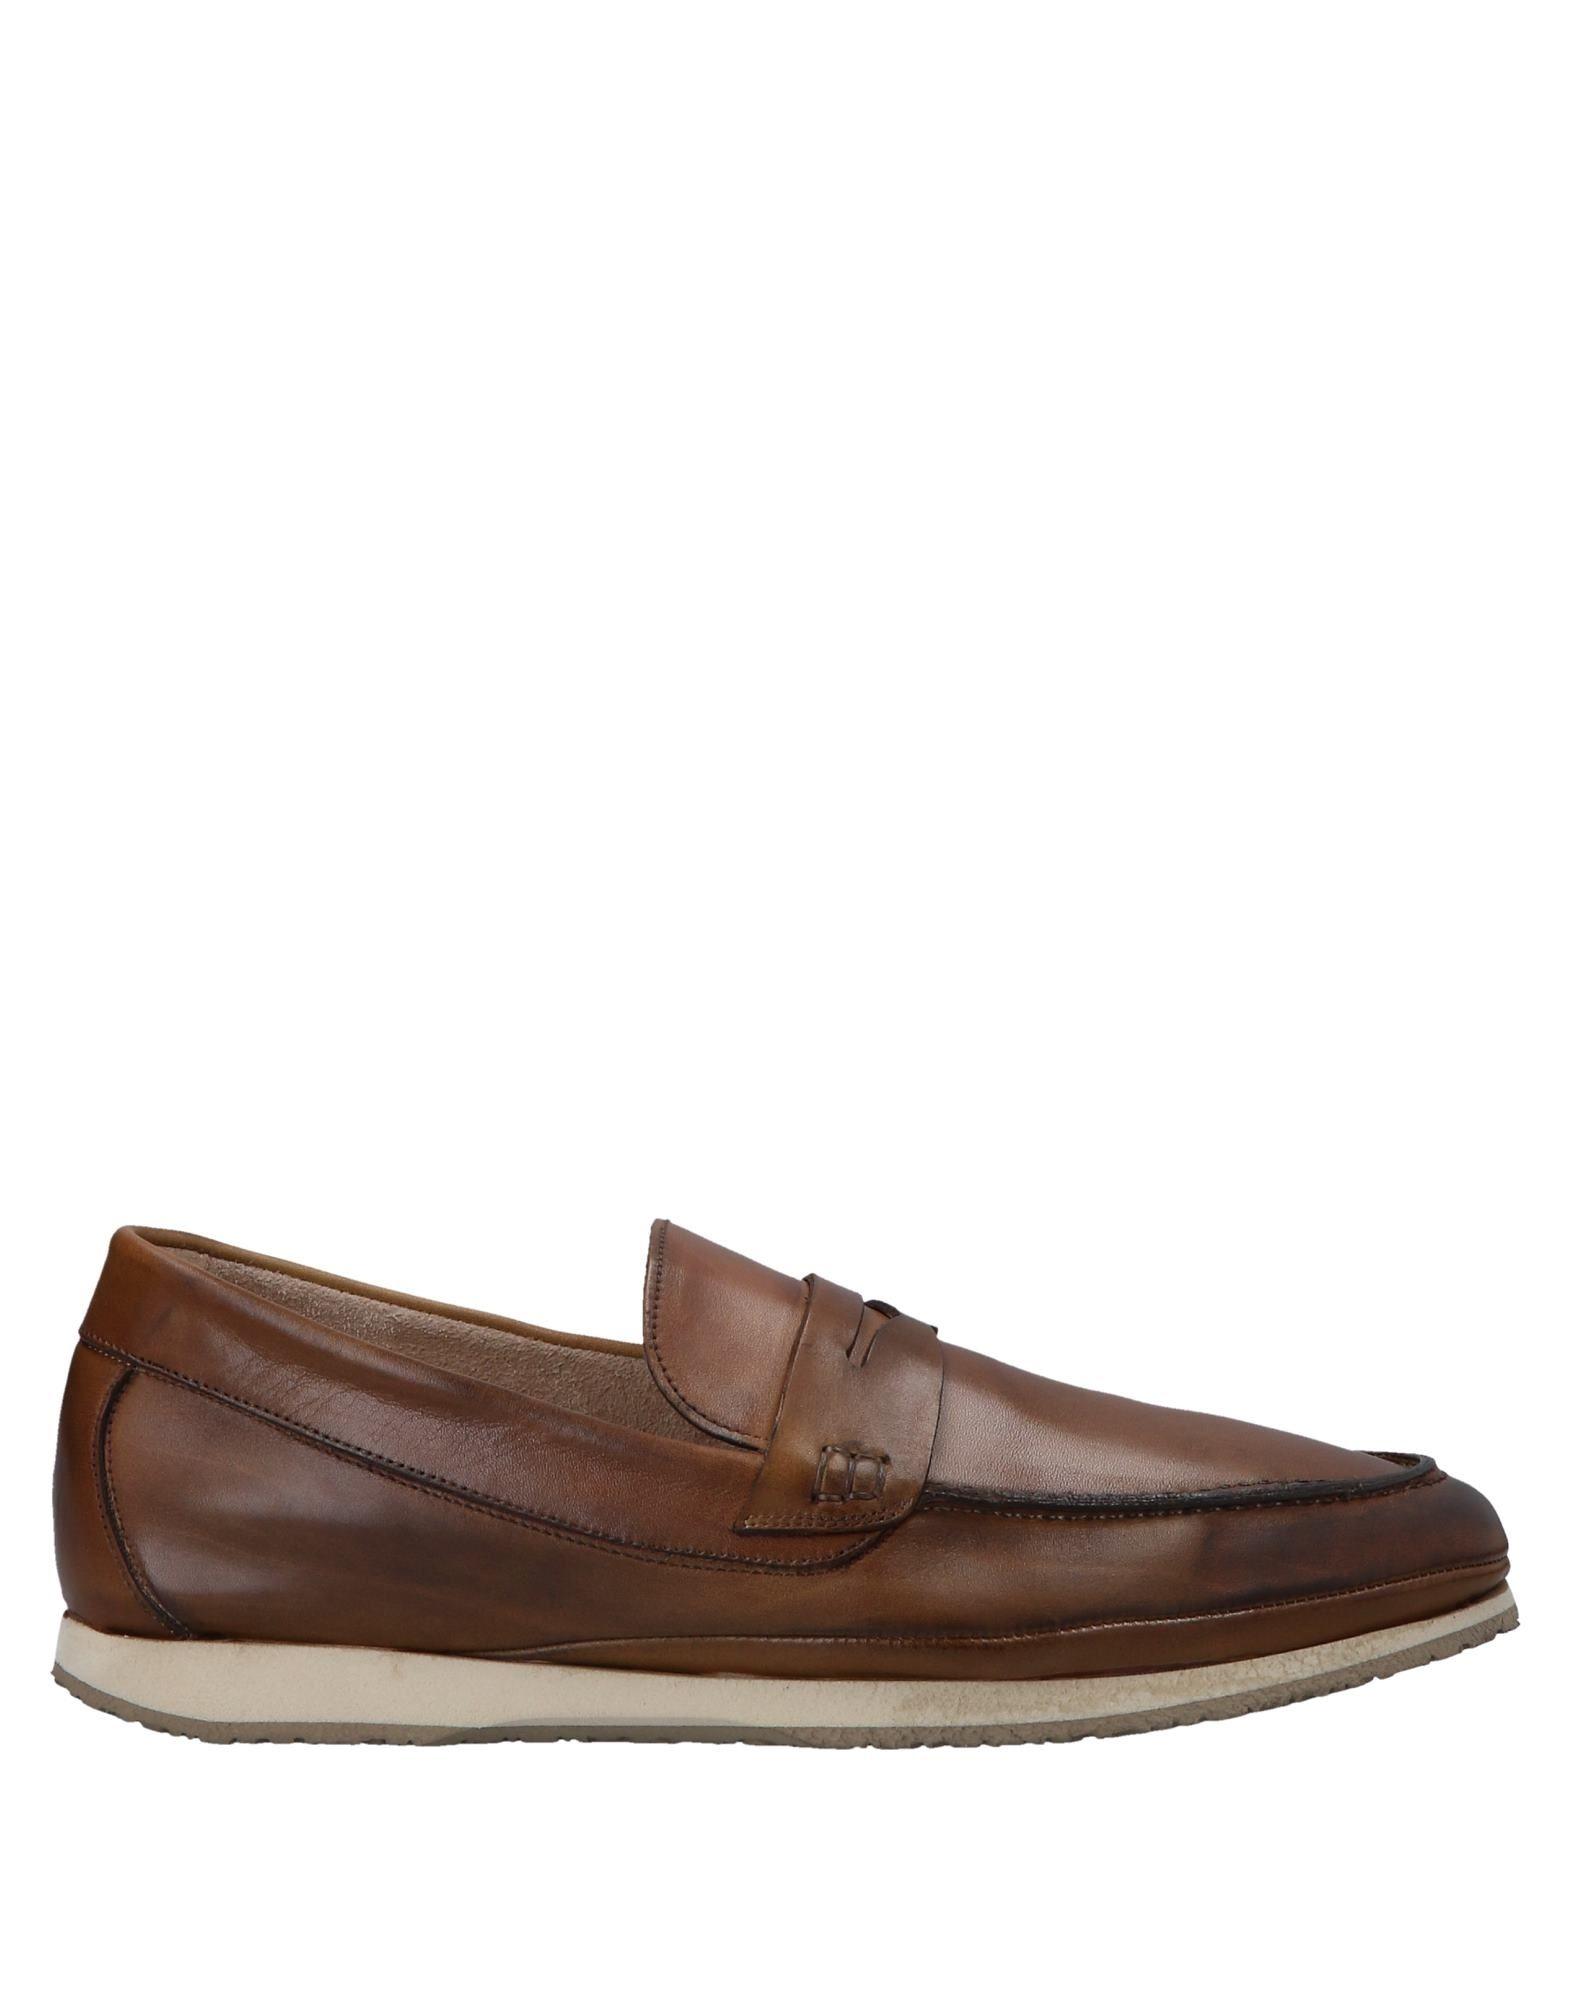 Calpierre Mokassins Herren Qualität  11551906KL Gute Qualität Herren beliebte Schuhe 7a1ca0